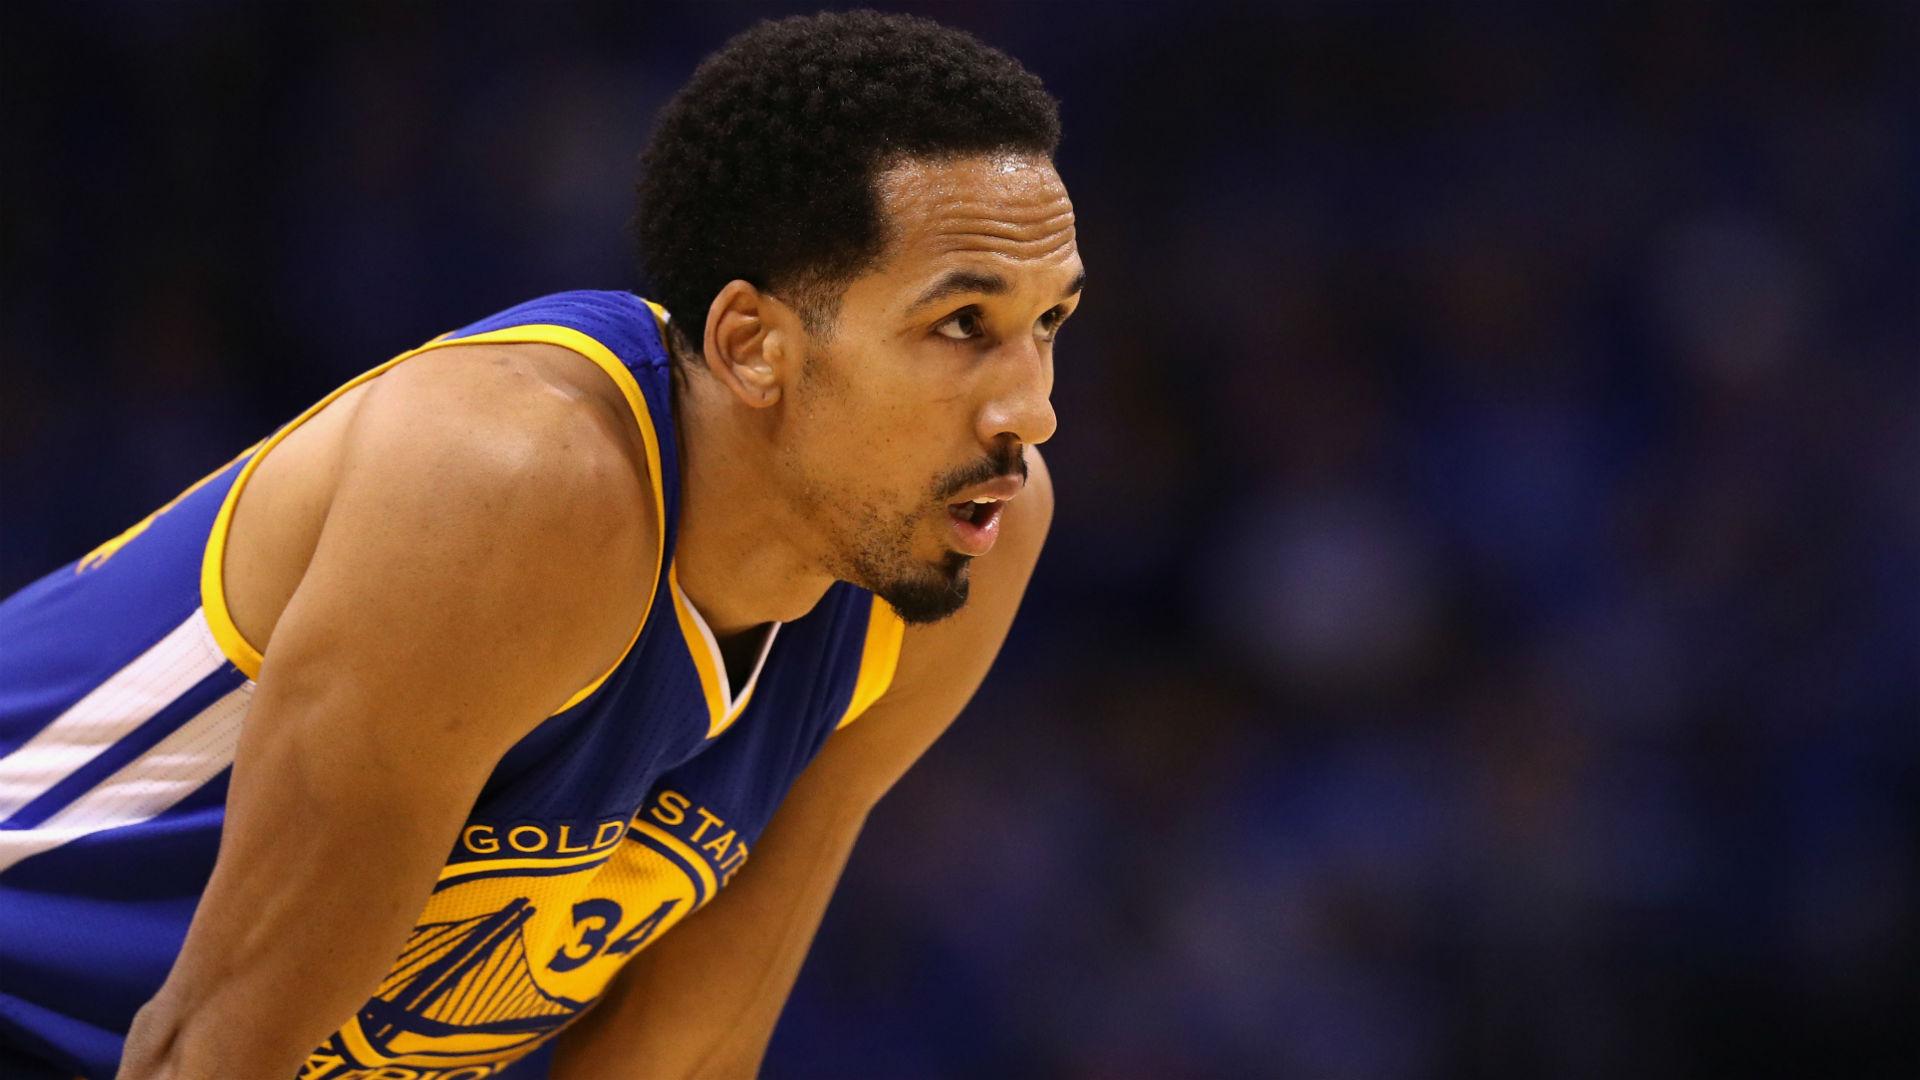 NBA official Courtney Kirkland, Warriors' Shaun Livingston suspended for altercation